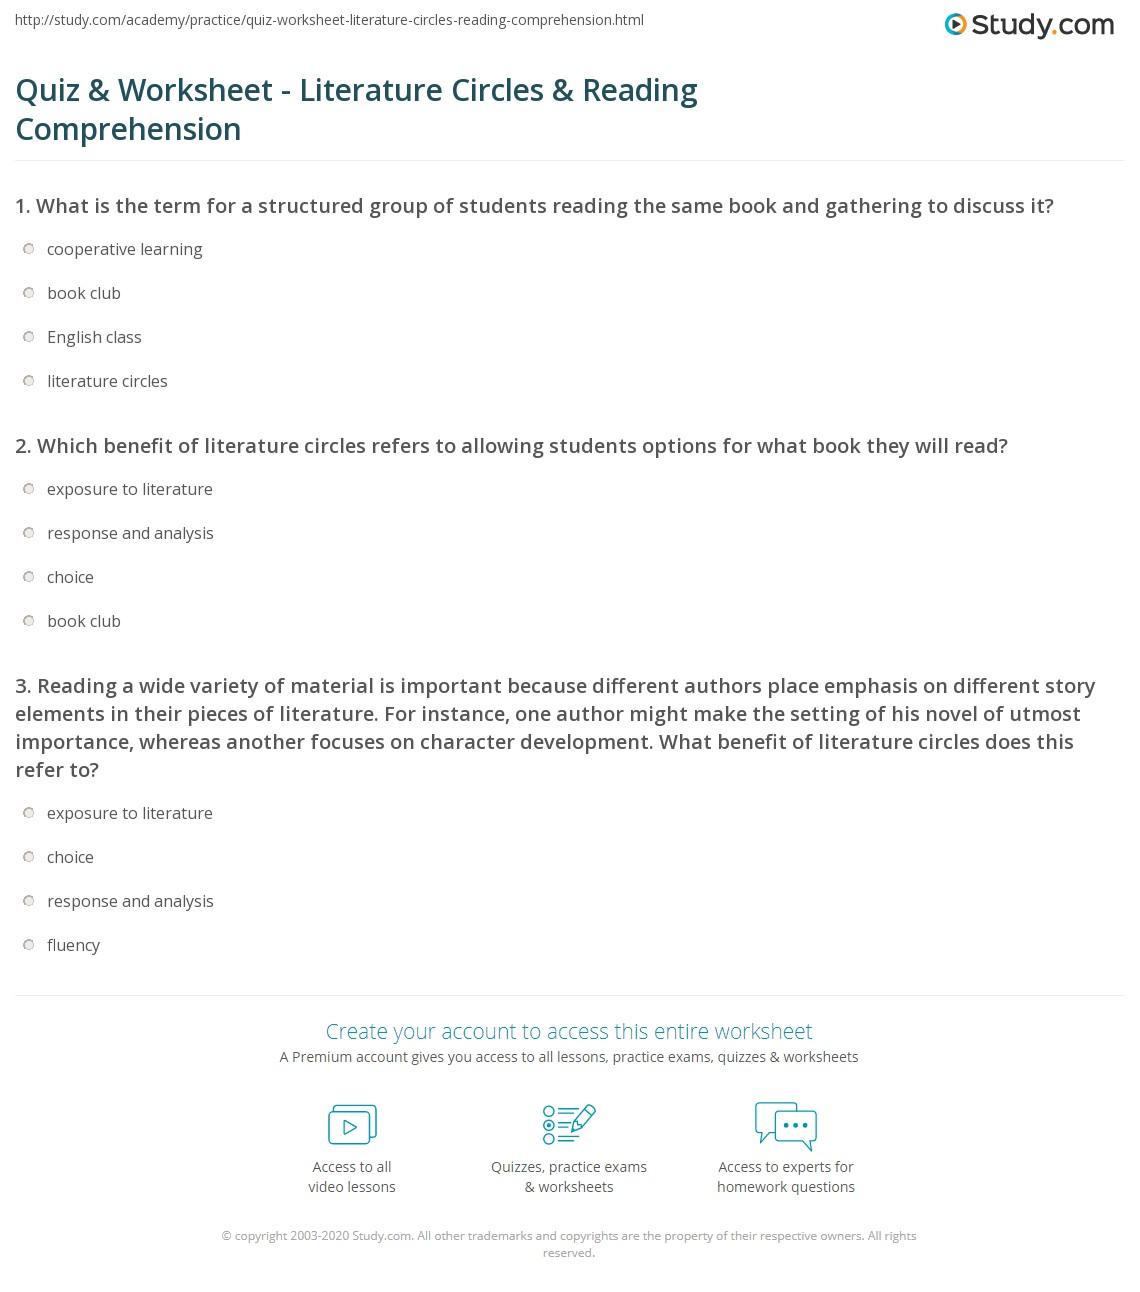 Quiz Worksheet Literature Circles Reading